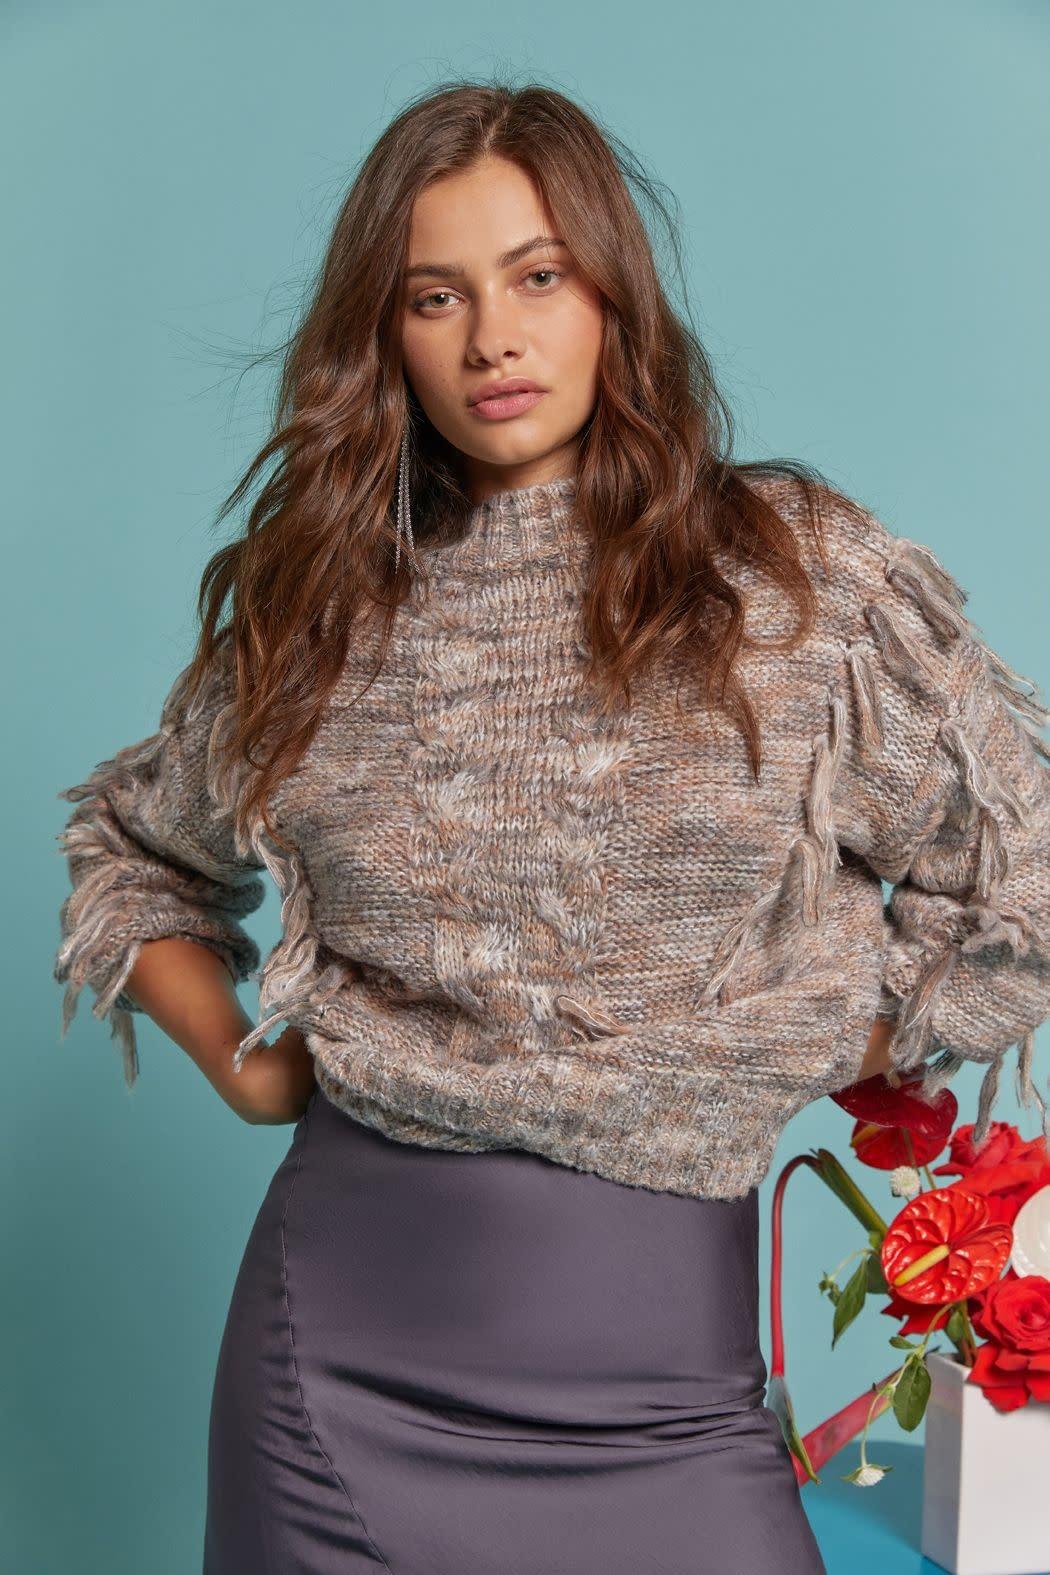 Atikshop Ombre Fringe Sweater